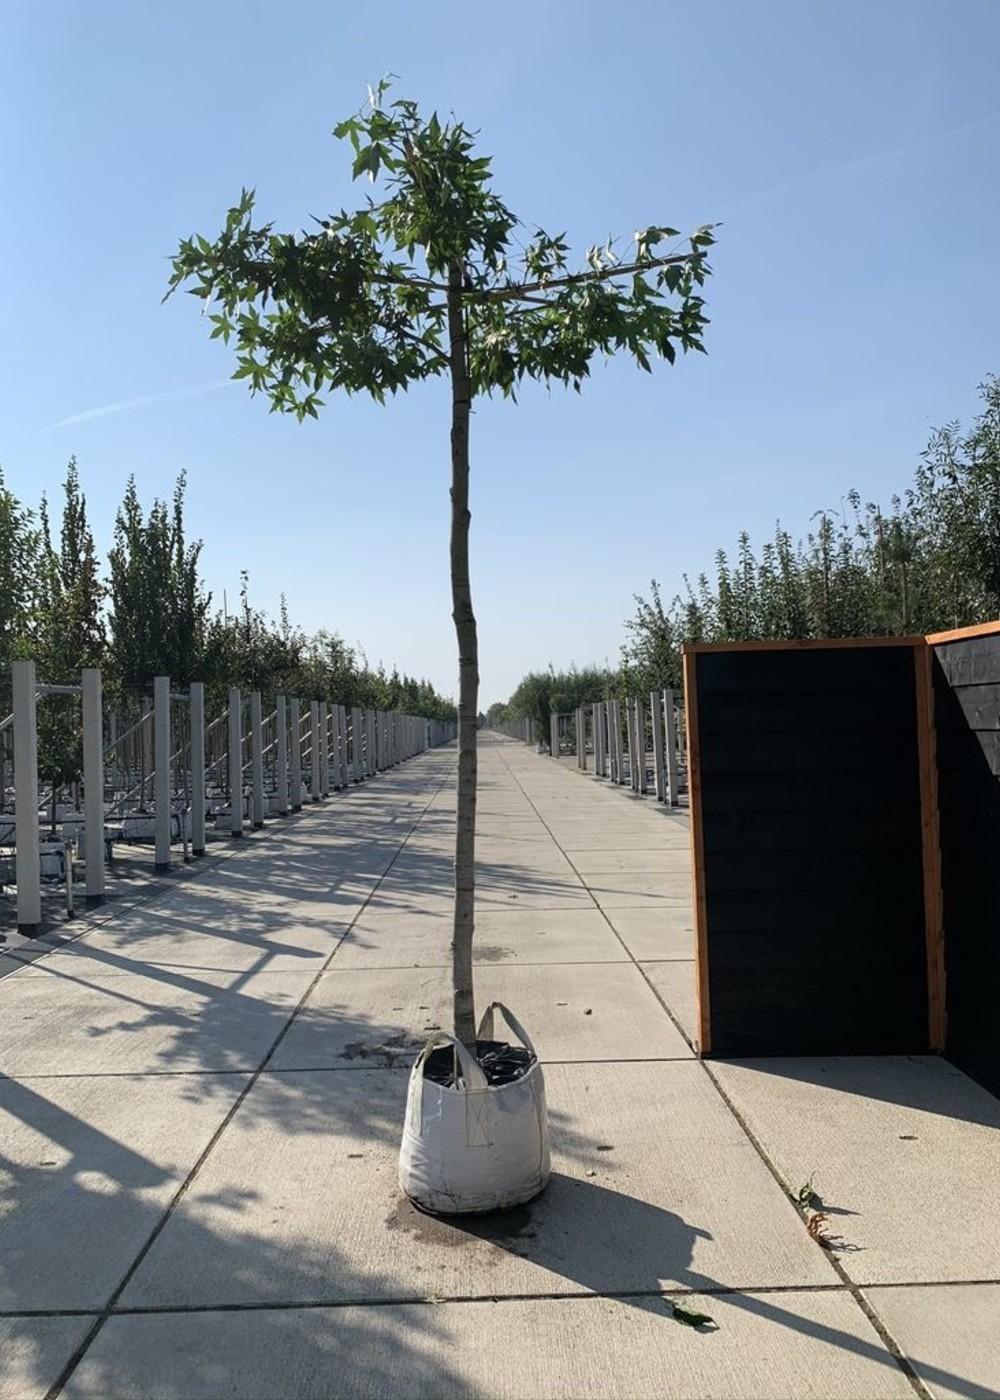 Amberbaum Worplesdon Dachbaum | Liquidambar styraciflua 'Worplesdon' Dachbaum